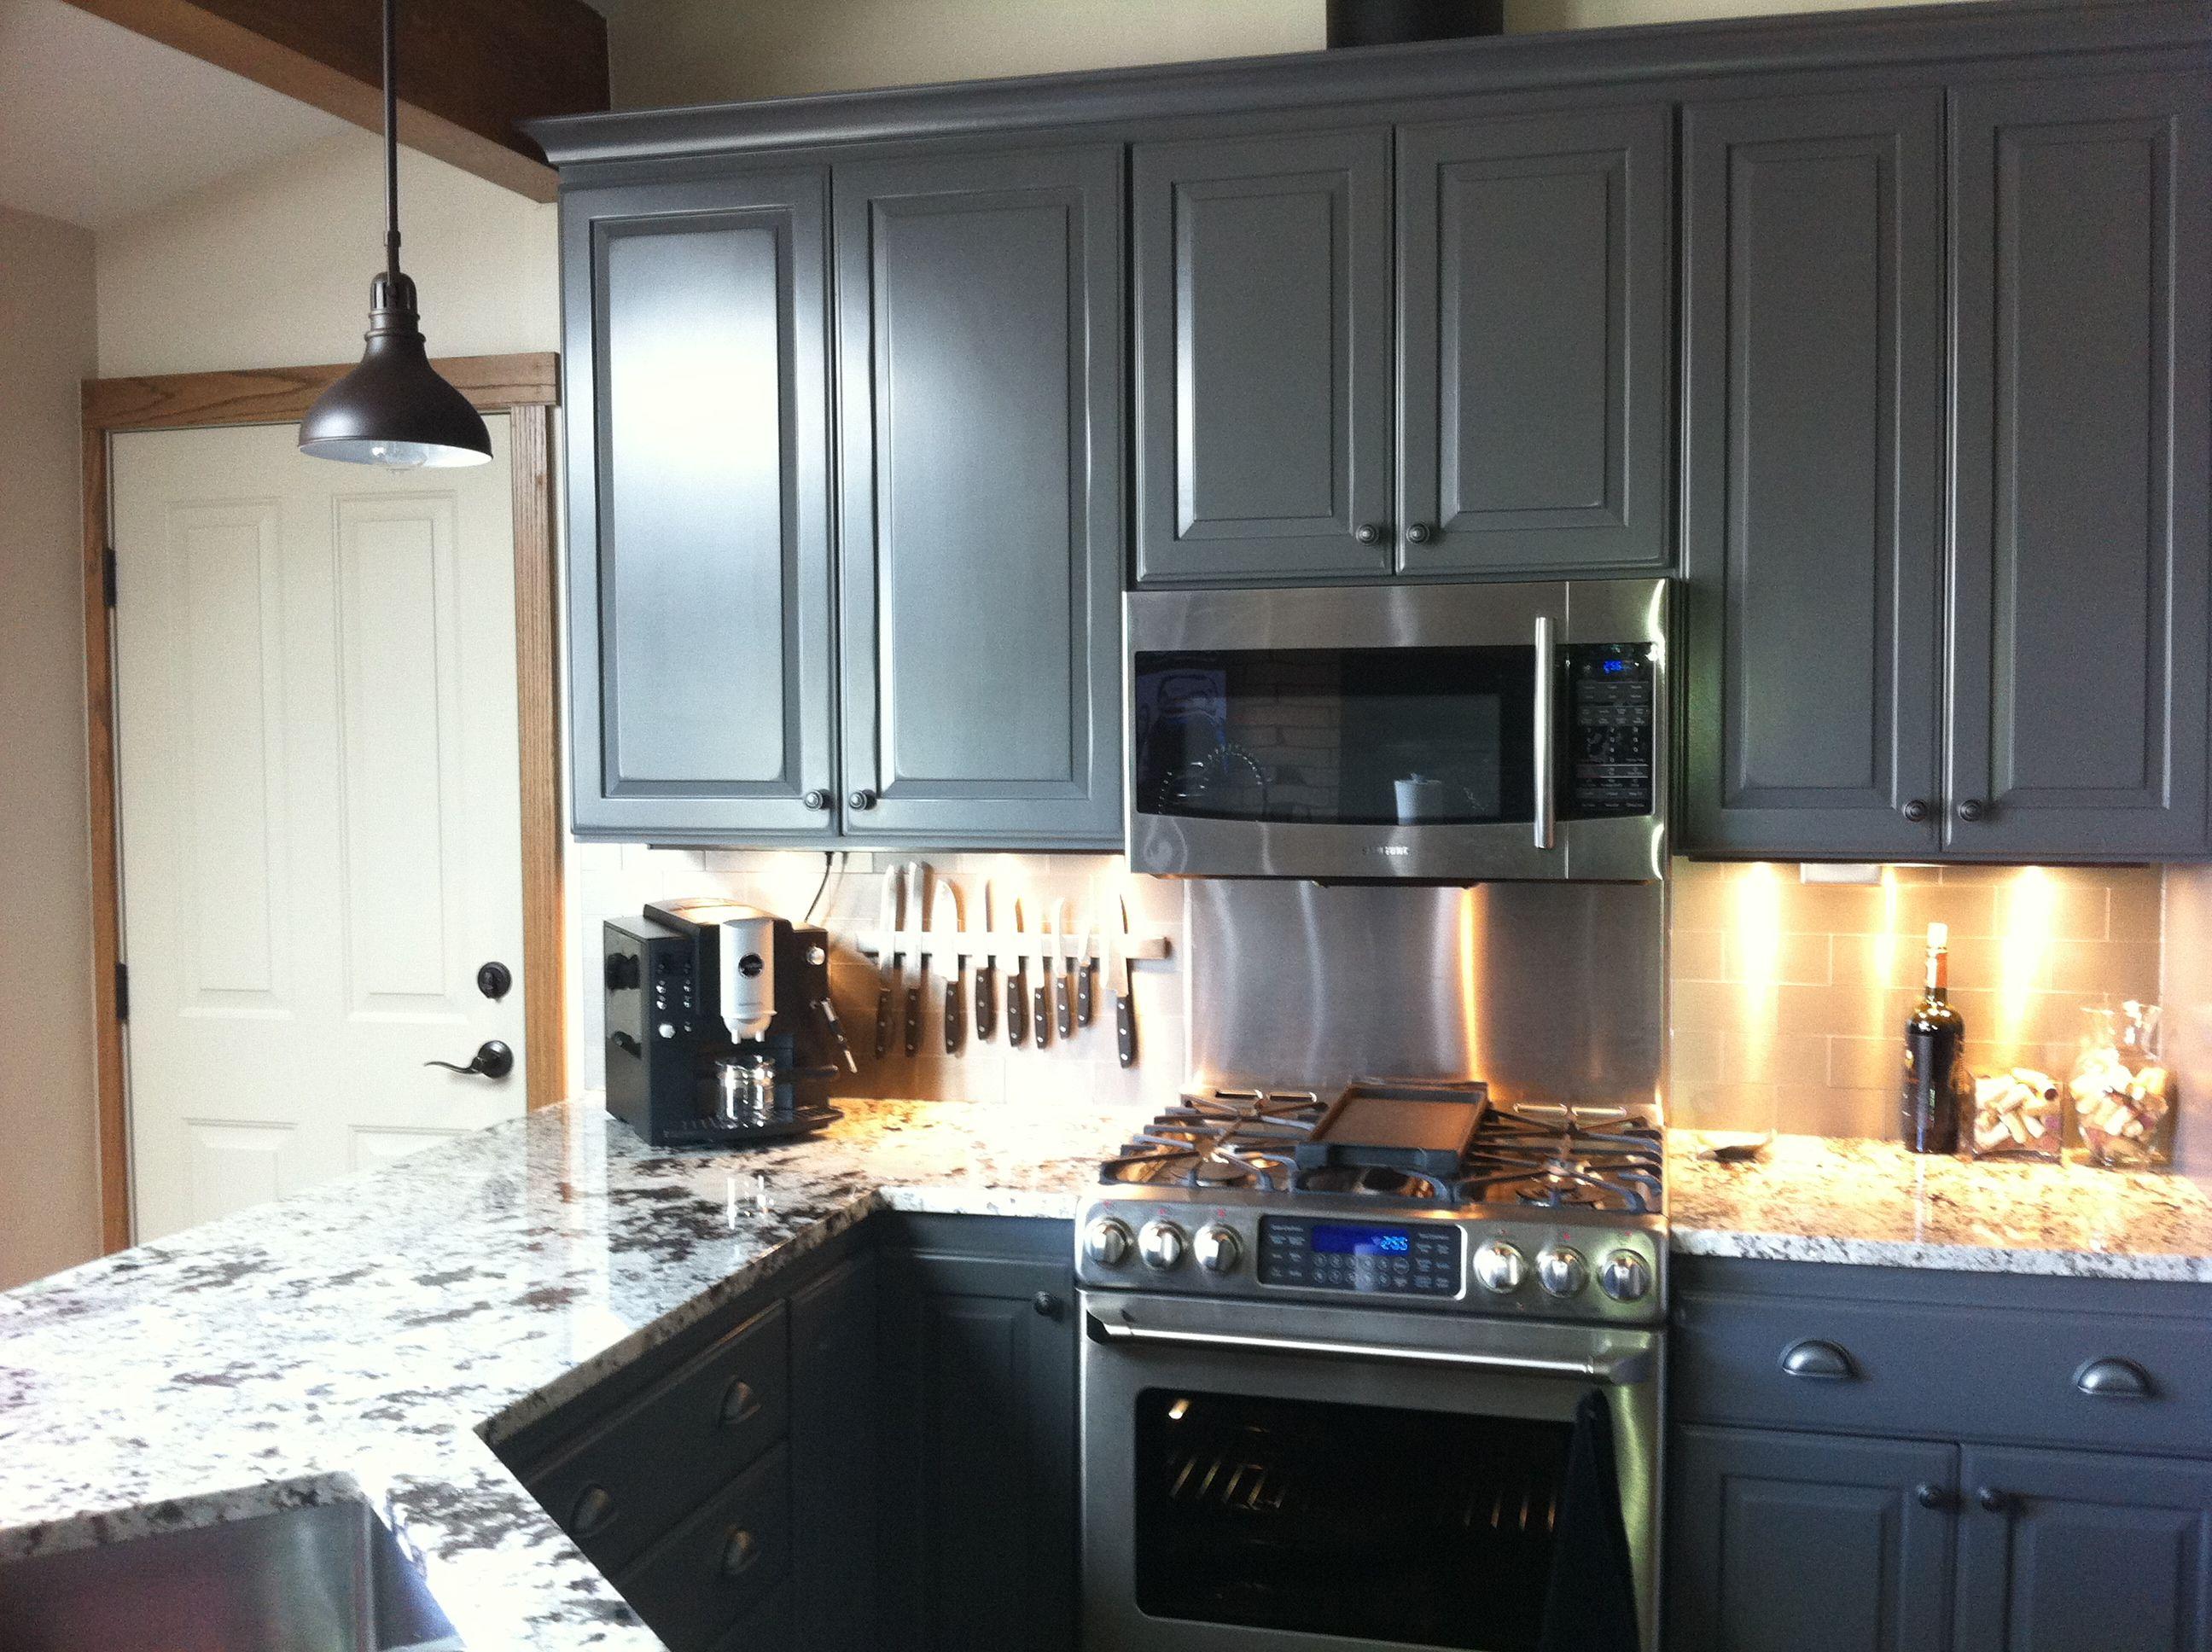 Stainless Steel Subway Tile Backsplash Grey Kitchen